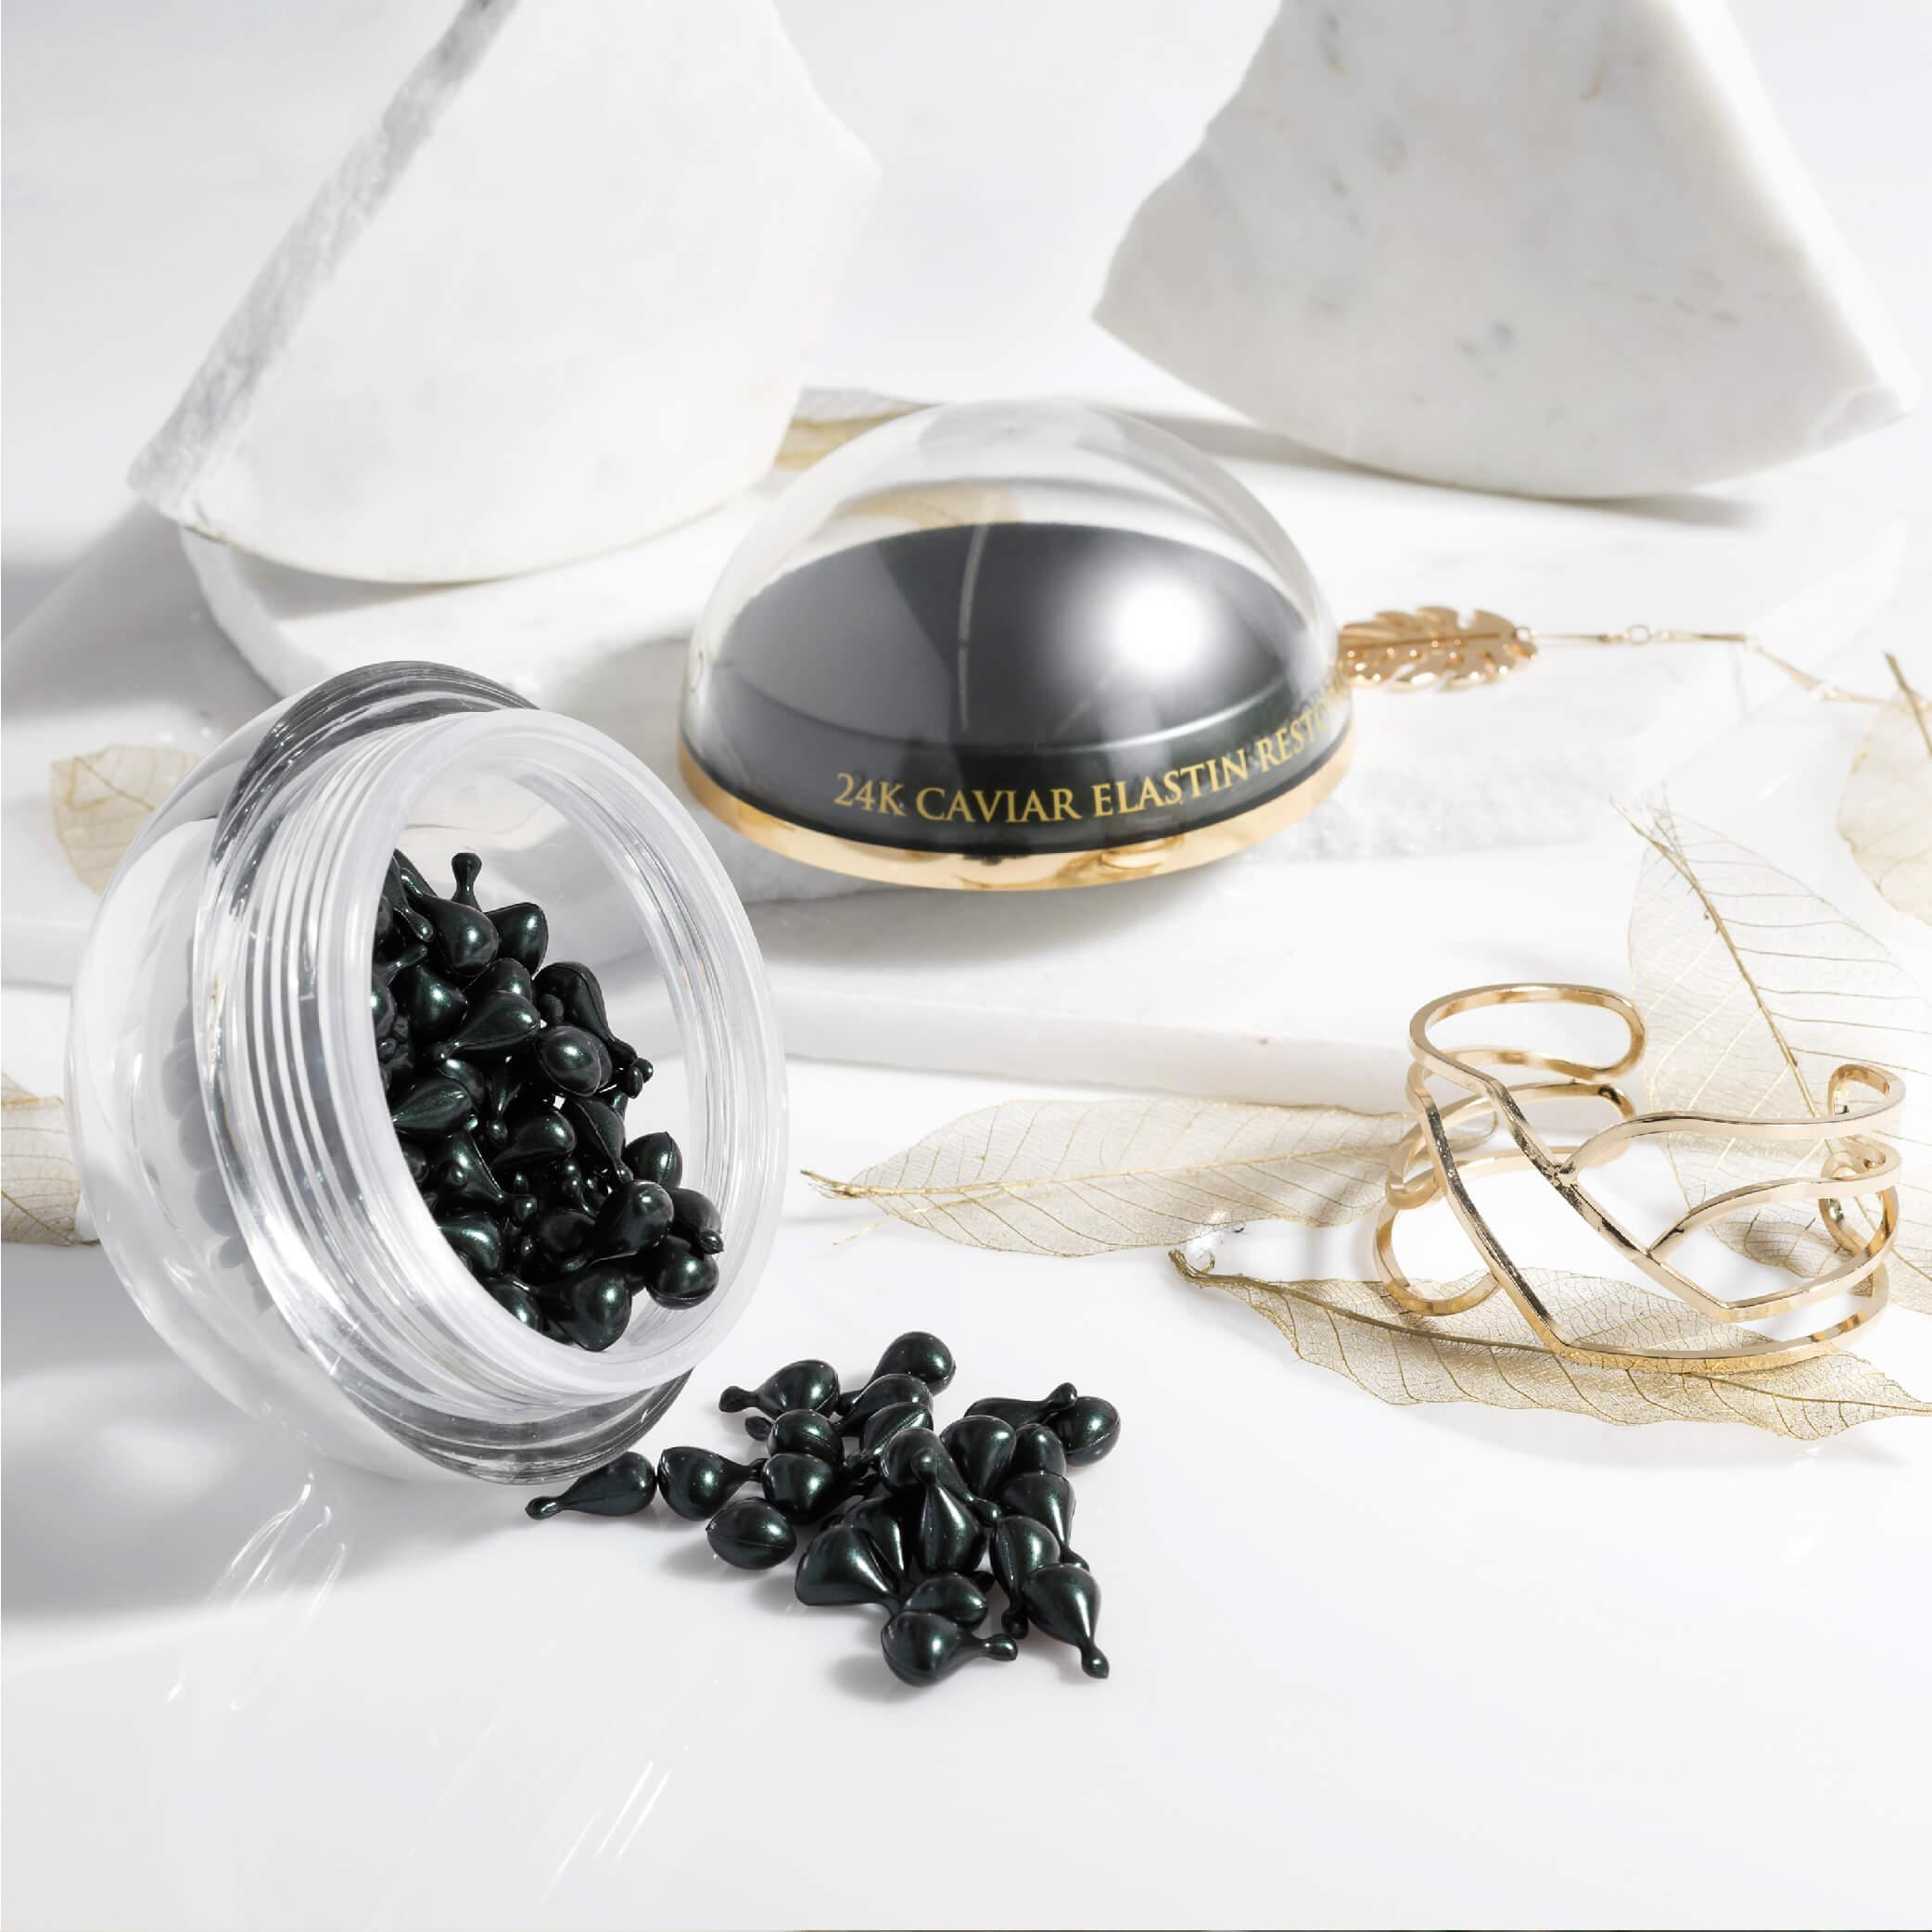 24K Caviar Elastin Restoration